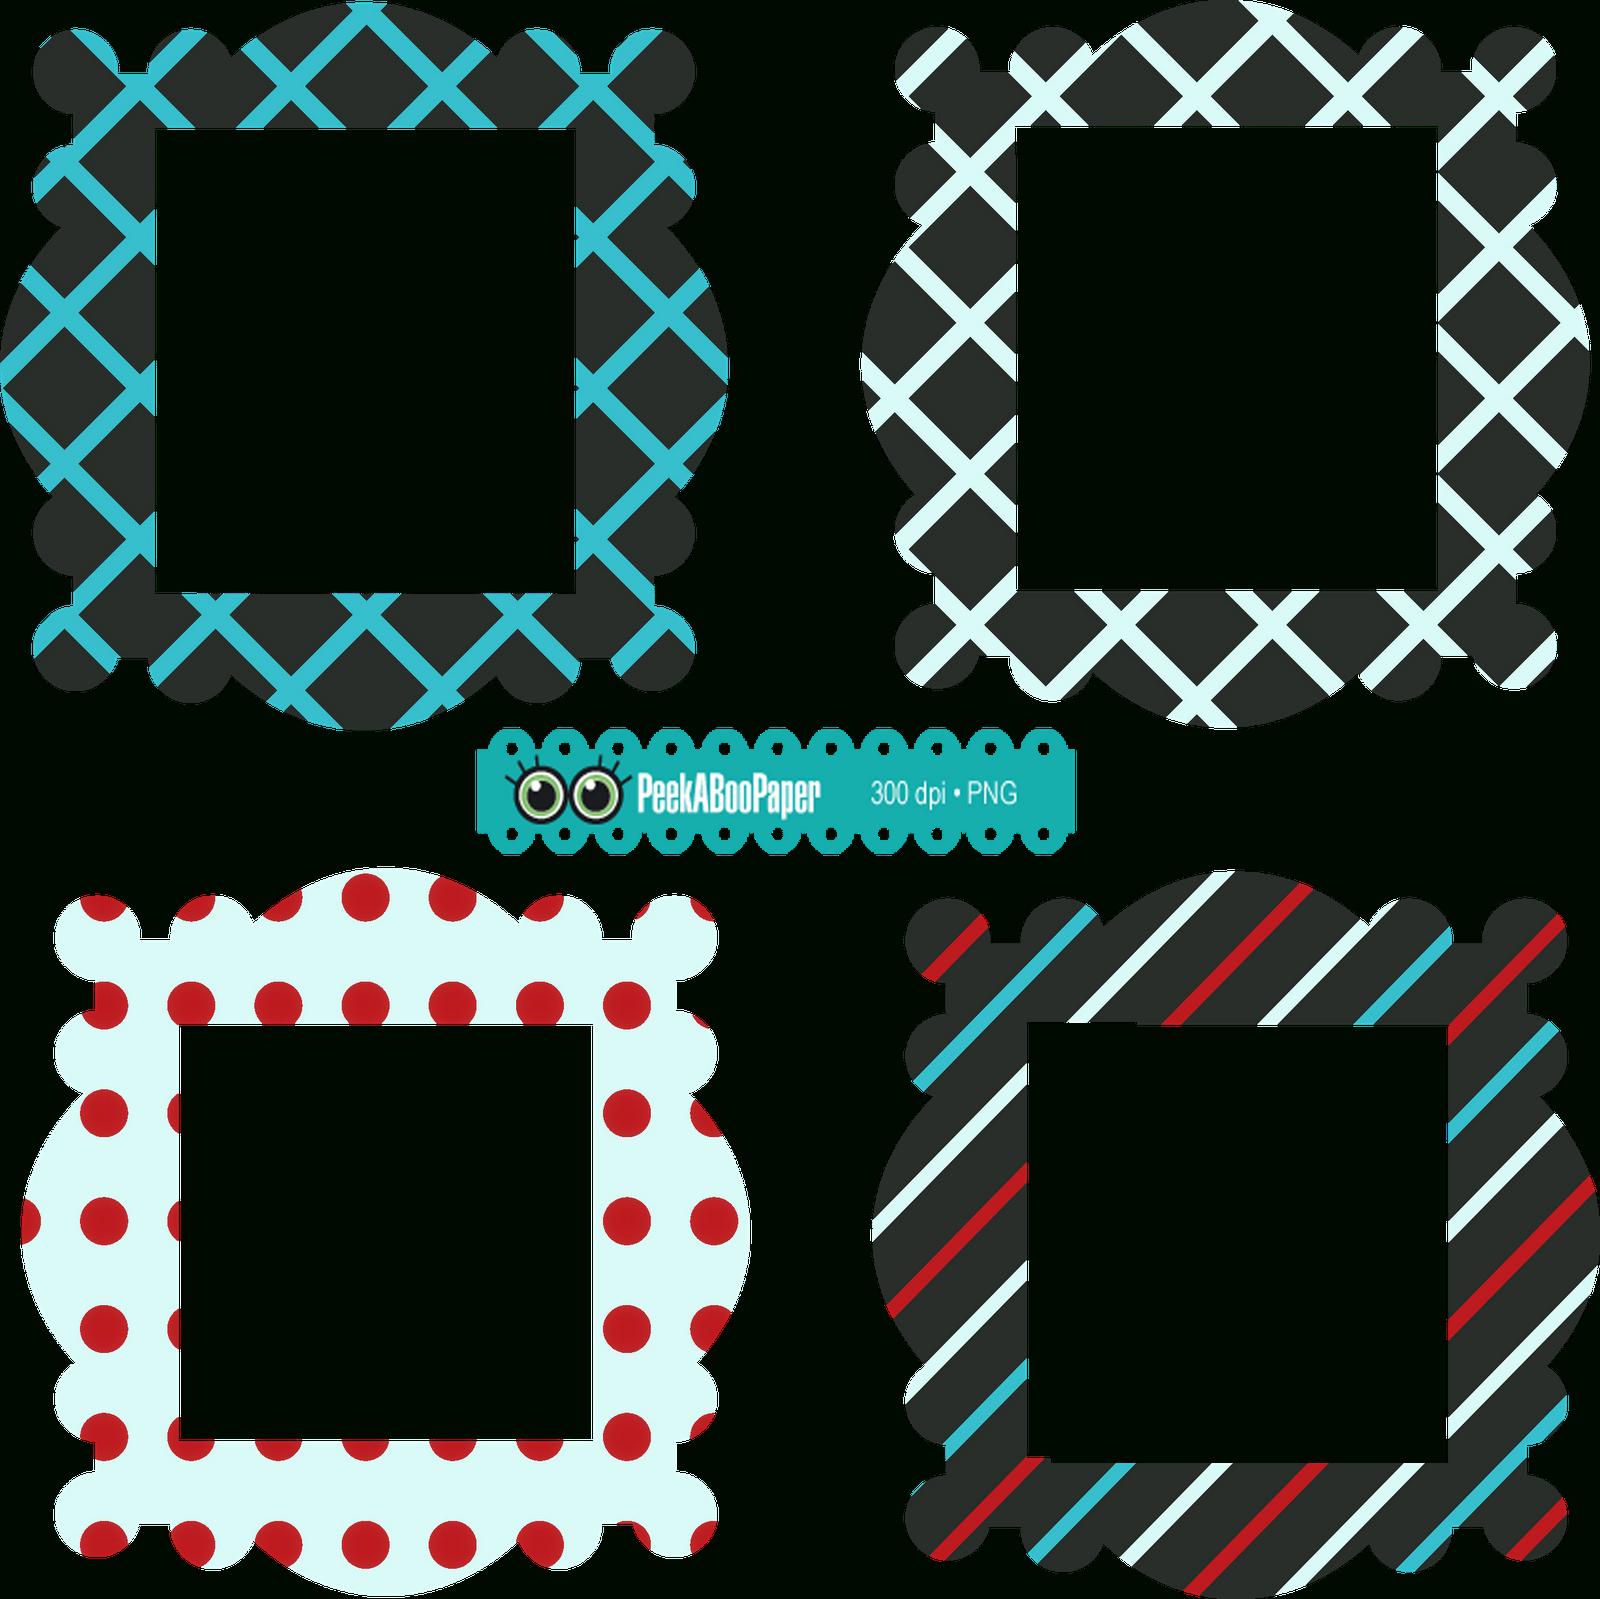 Free+Printable+Scrapbooking+Scrapbook+Frames | Sticker Charts - Free Printable Frames For Scrapbooking